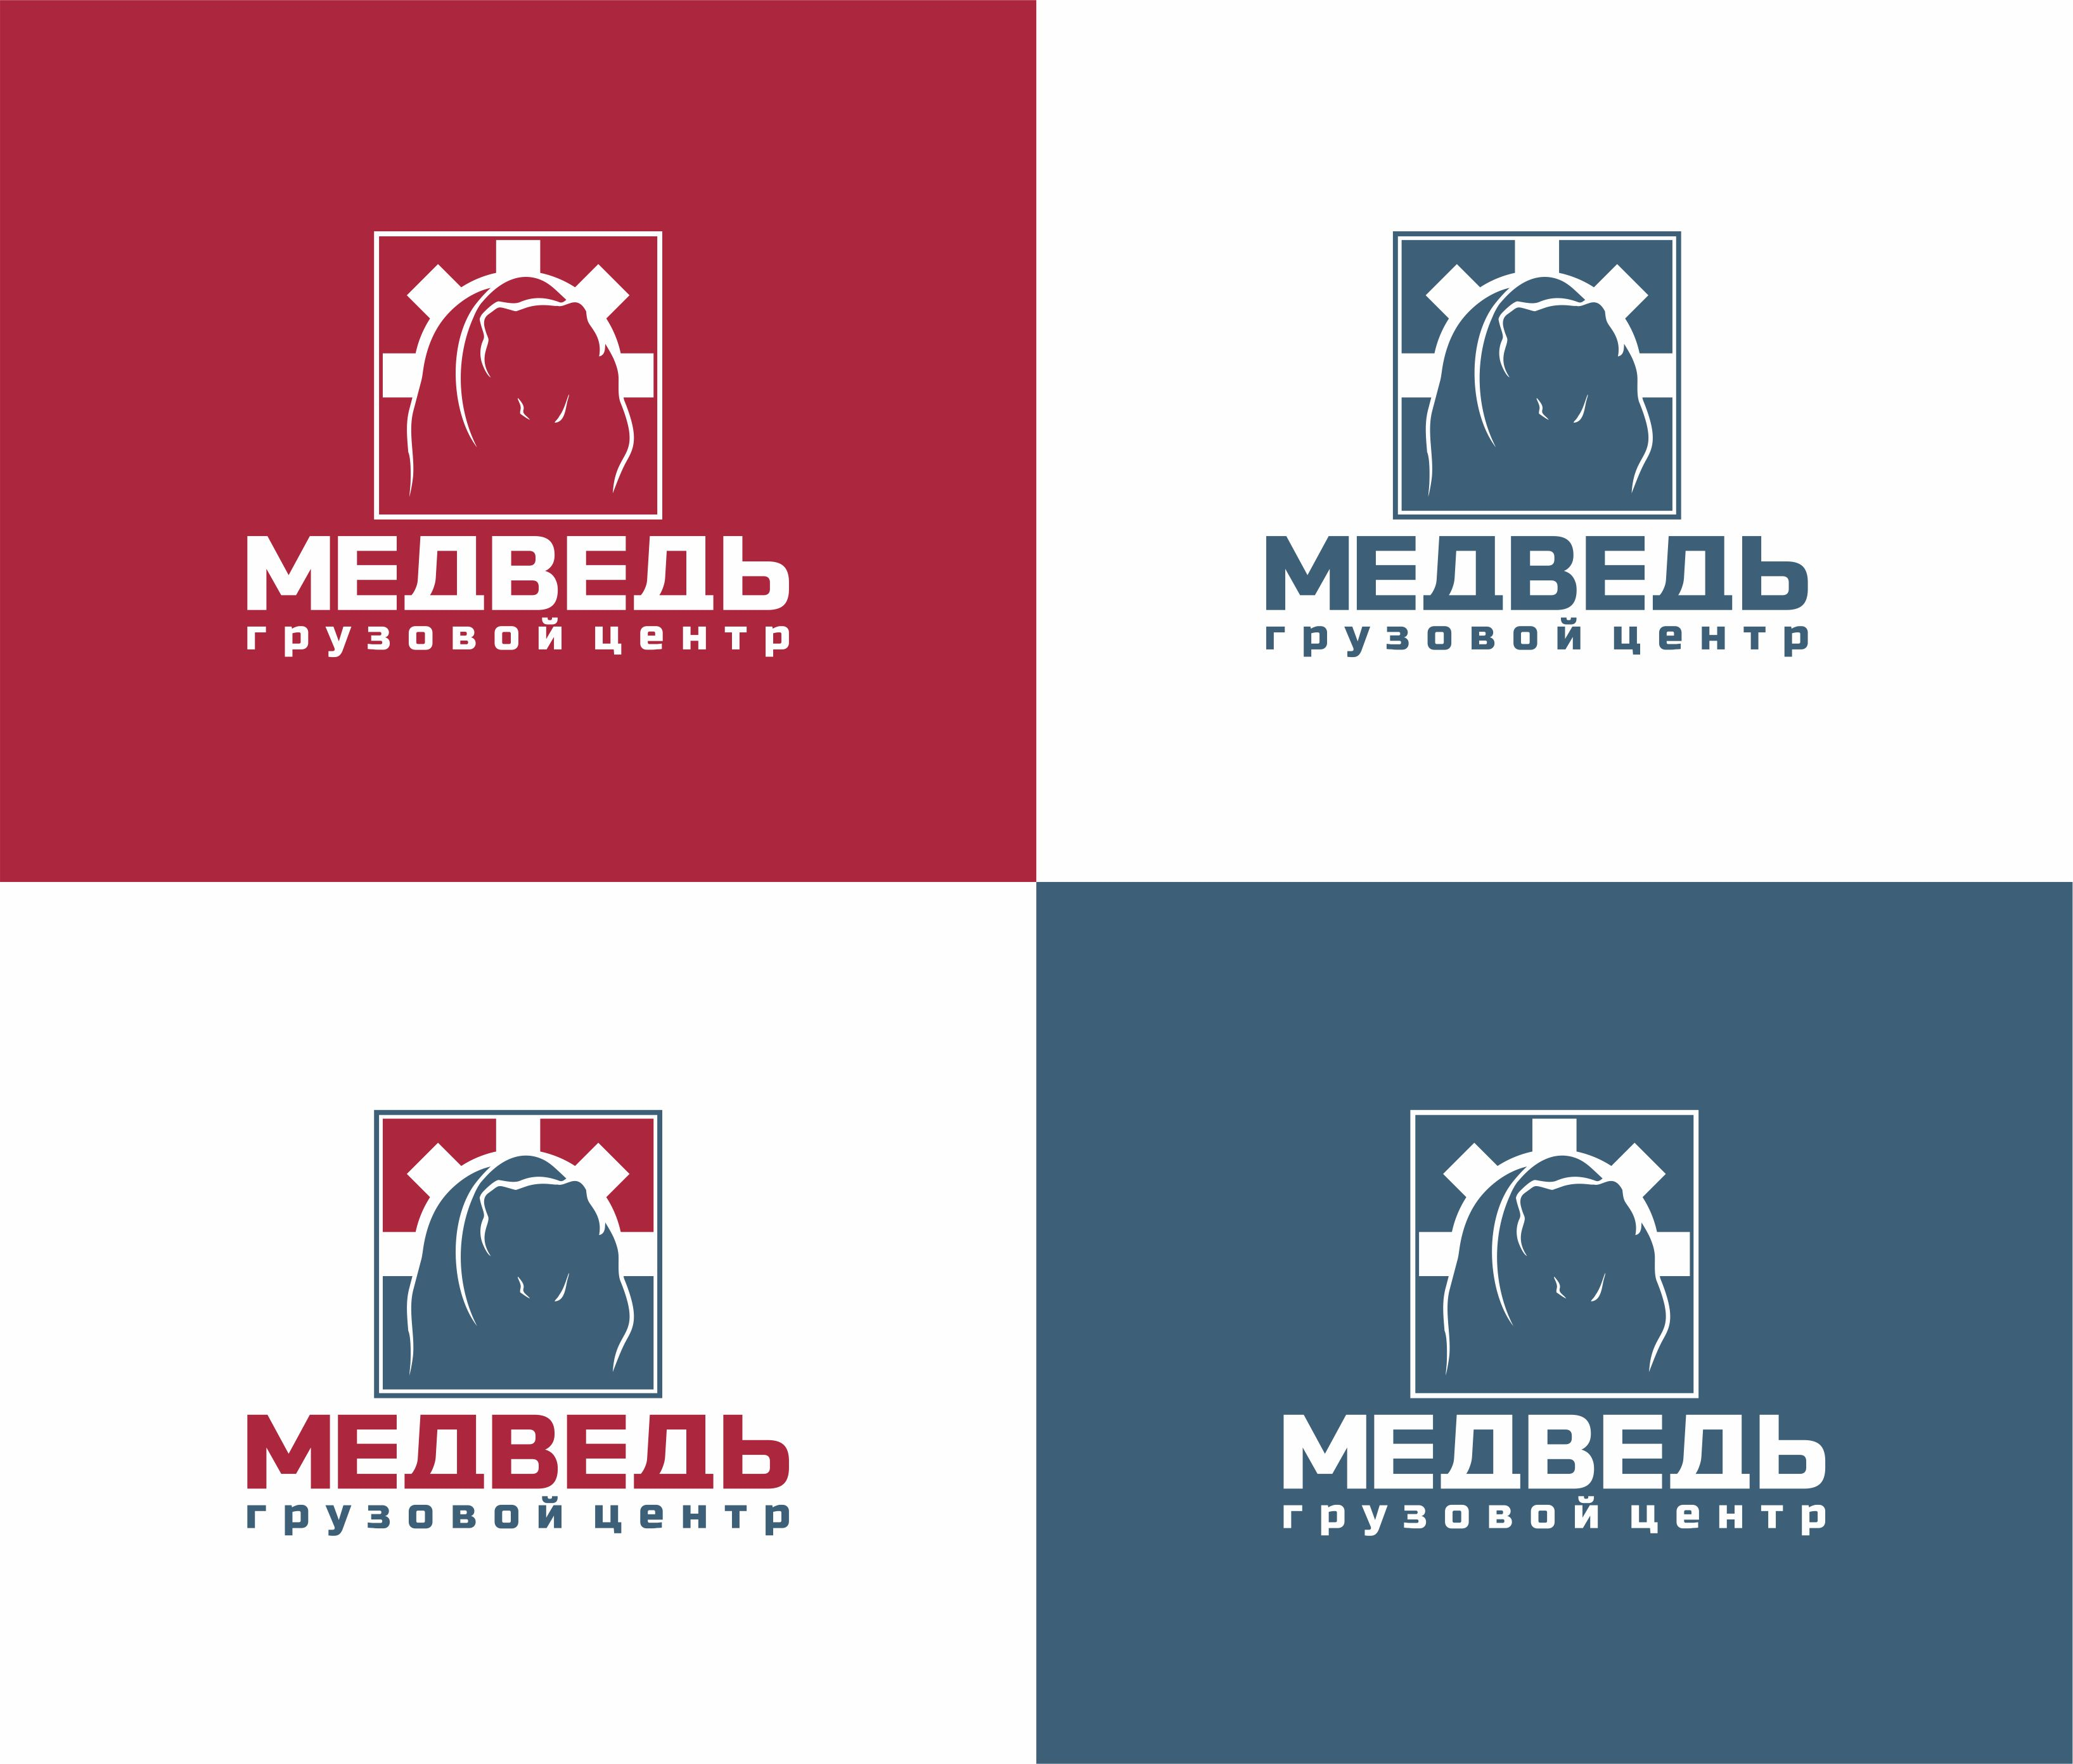 Разработка логотипа фото f_7285abc8bb00ff13.jpg